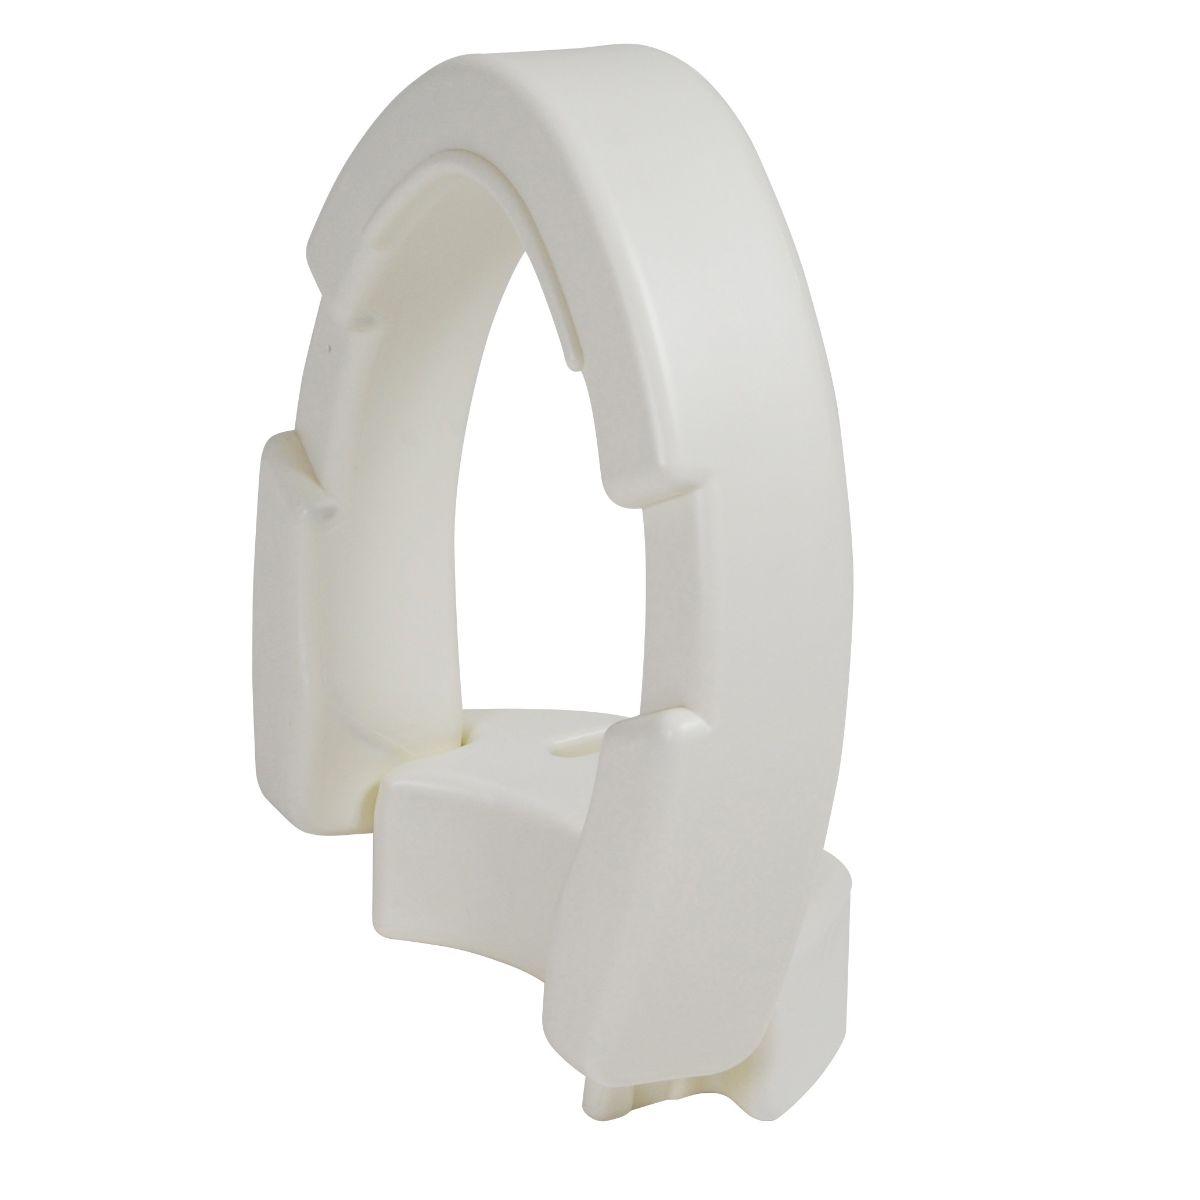 Hinged Toilet Seat Riser Buy Now Free Shipping